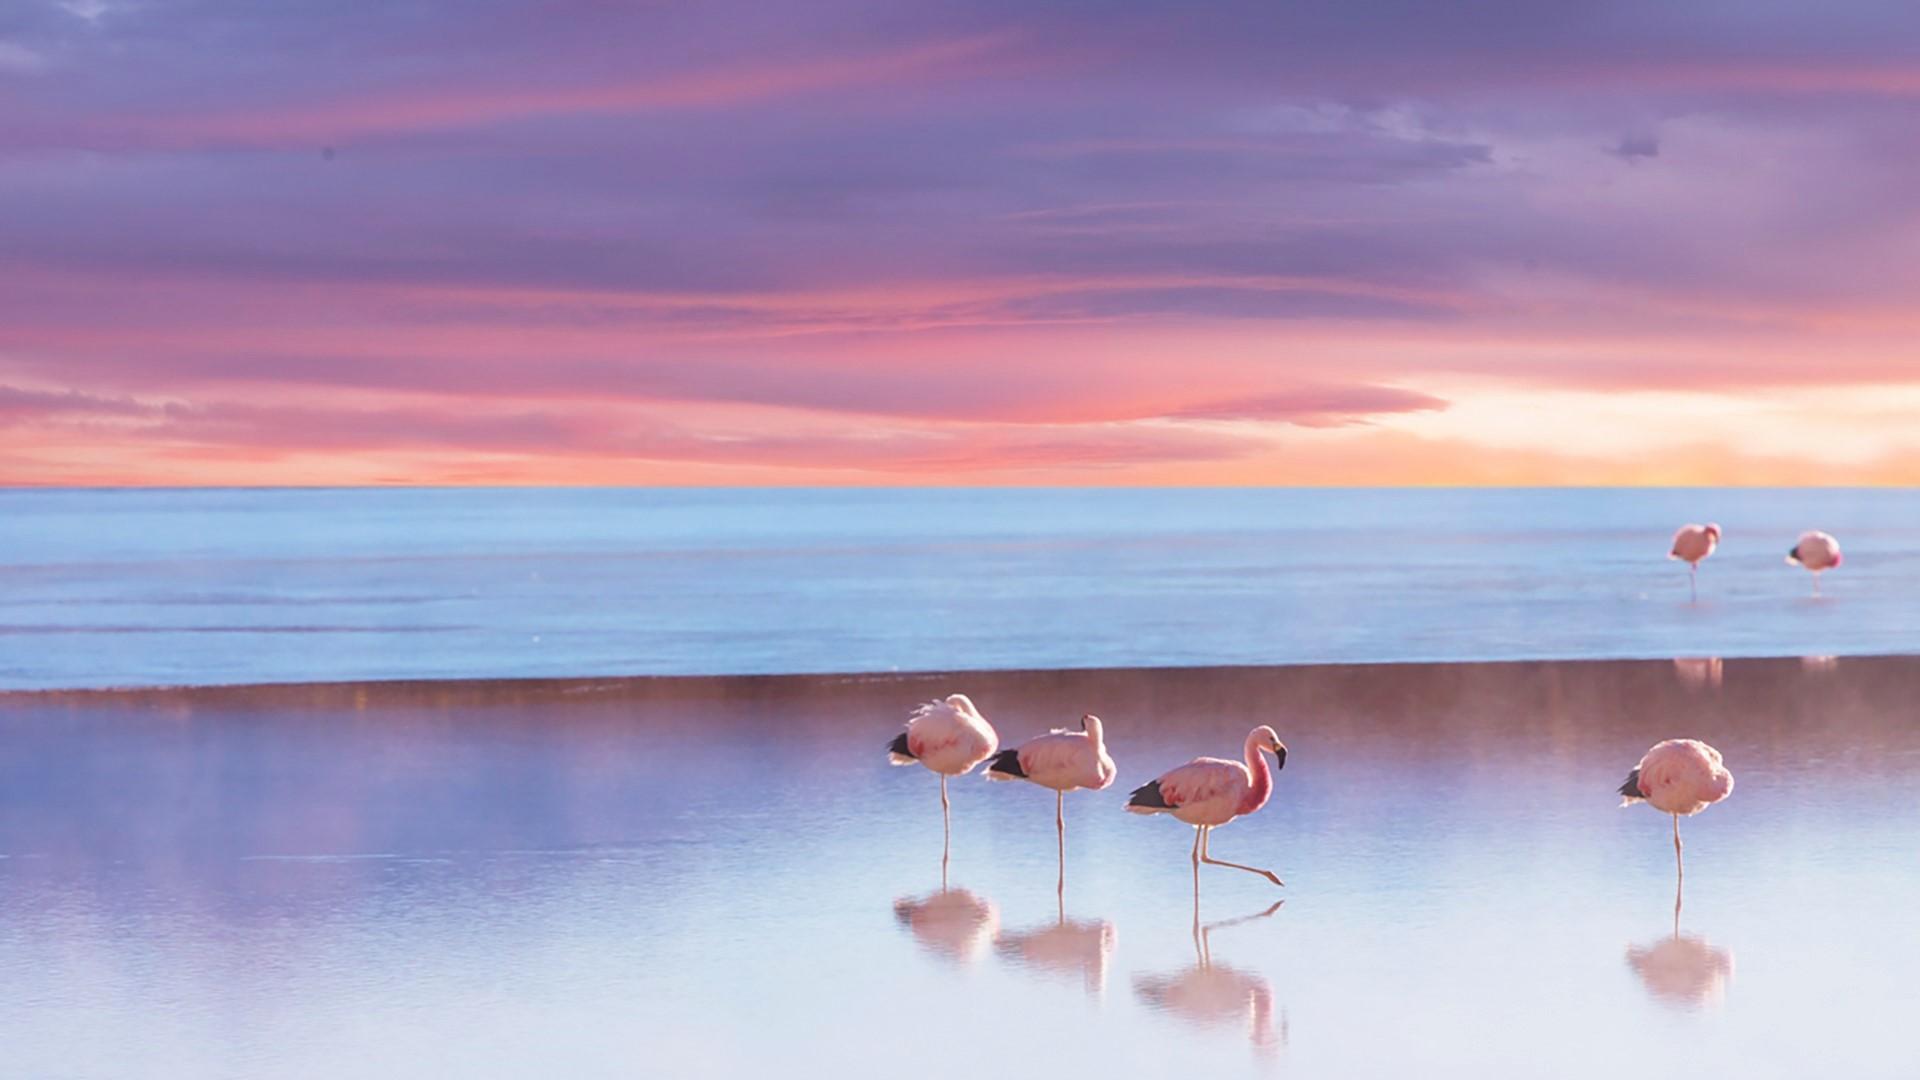 Animal Beach Bird Flamingo Horizon Ocean Sea Sunset 1920x1080